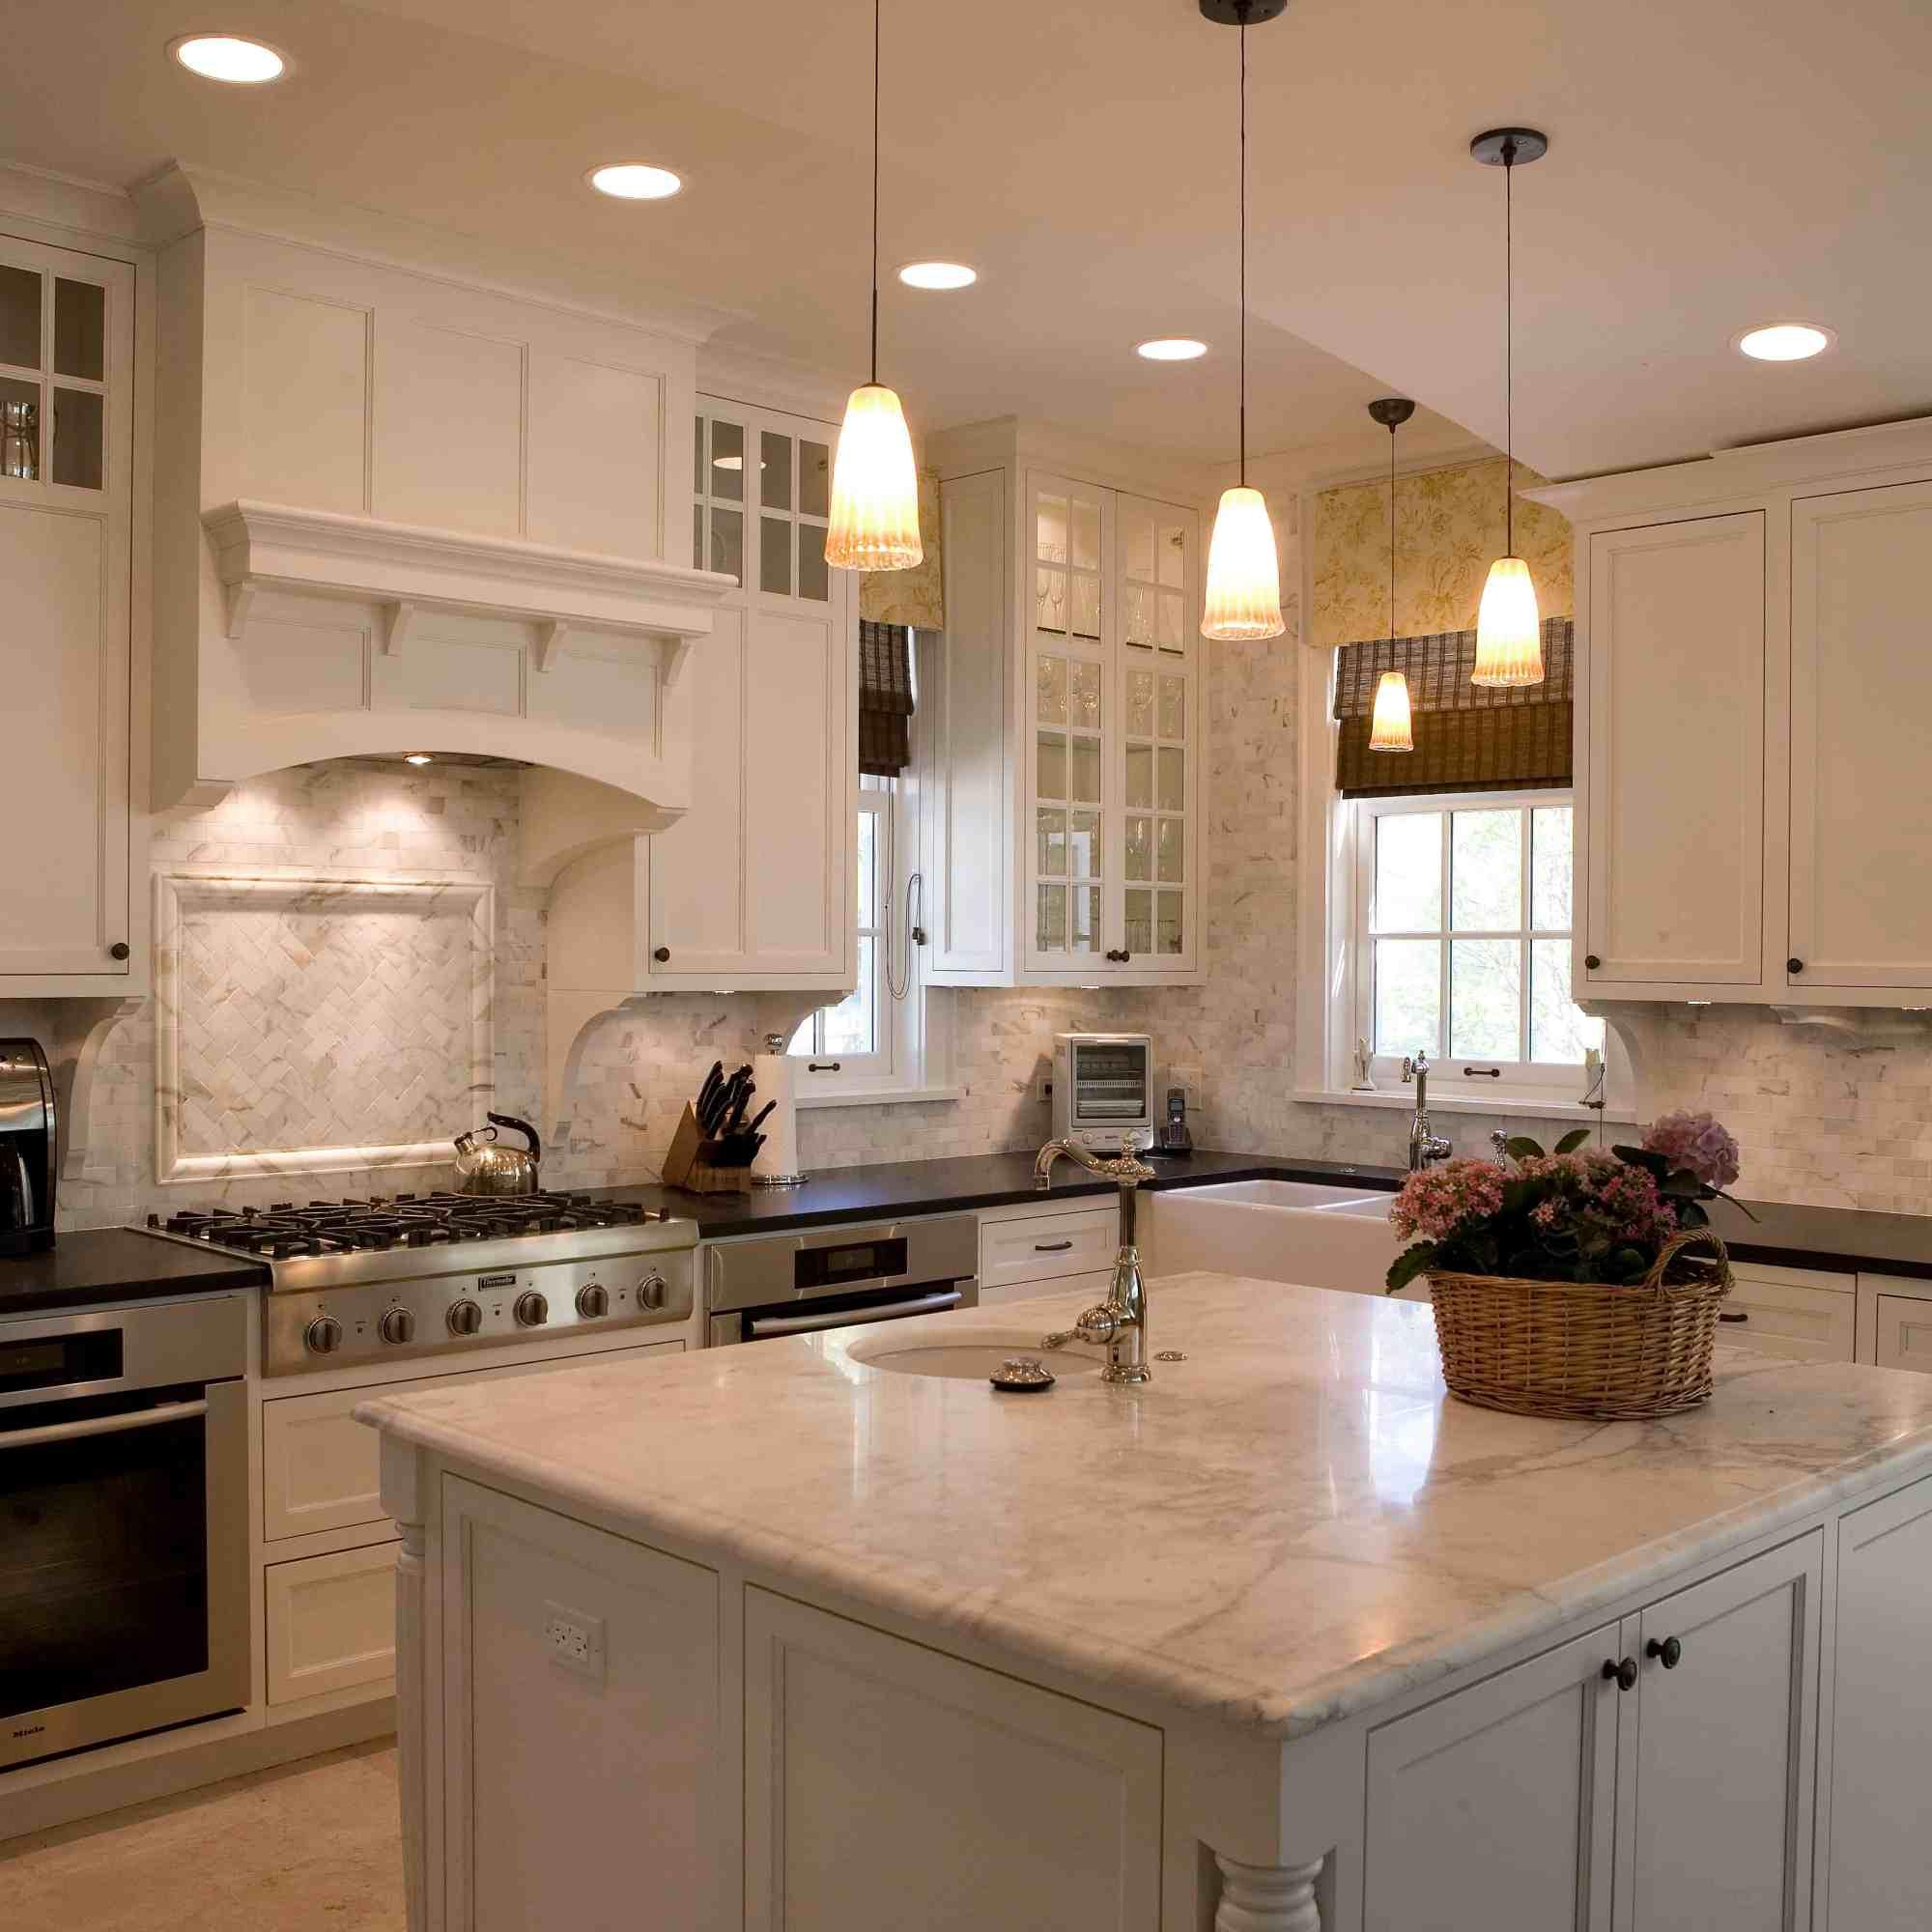 Residential Construction - Evanston - Renovation